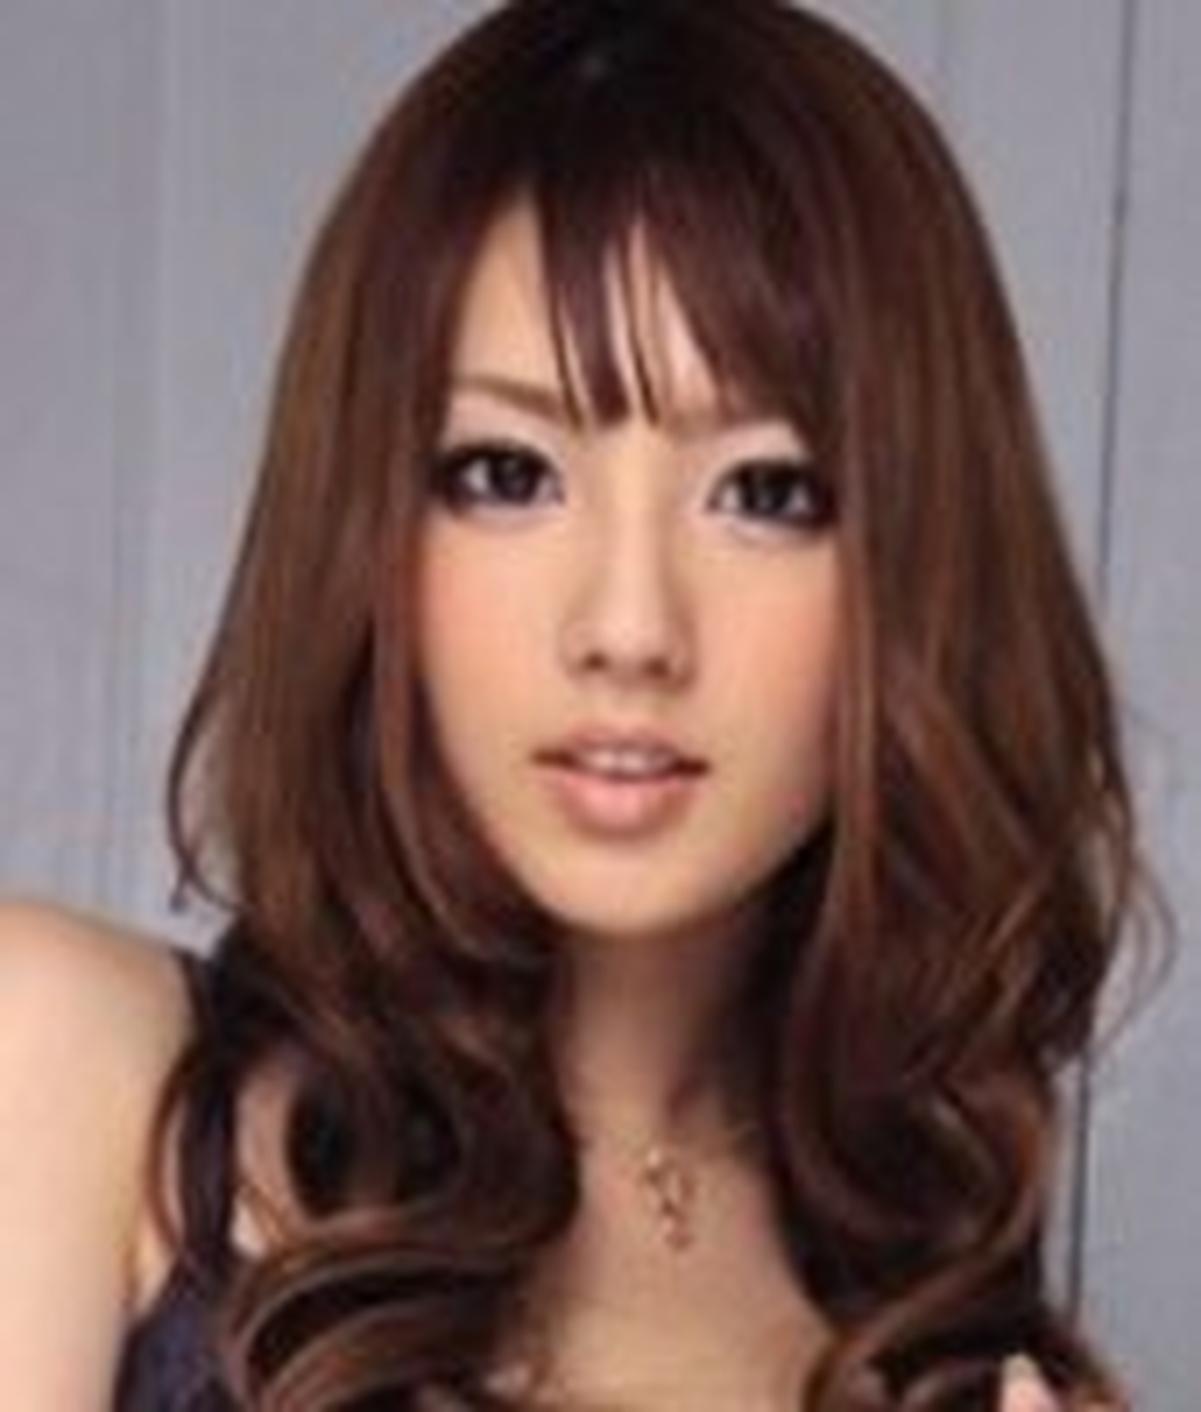 Tsubasa Amami